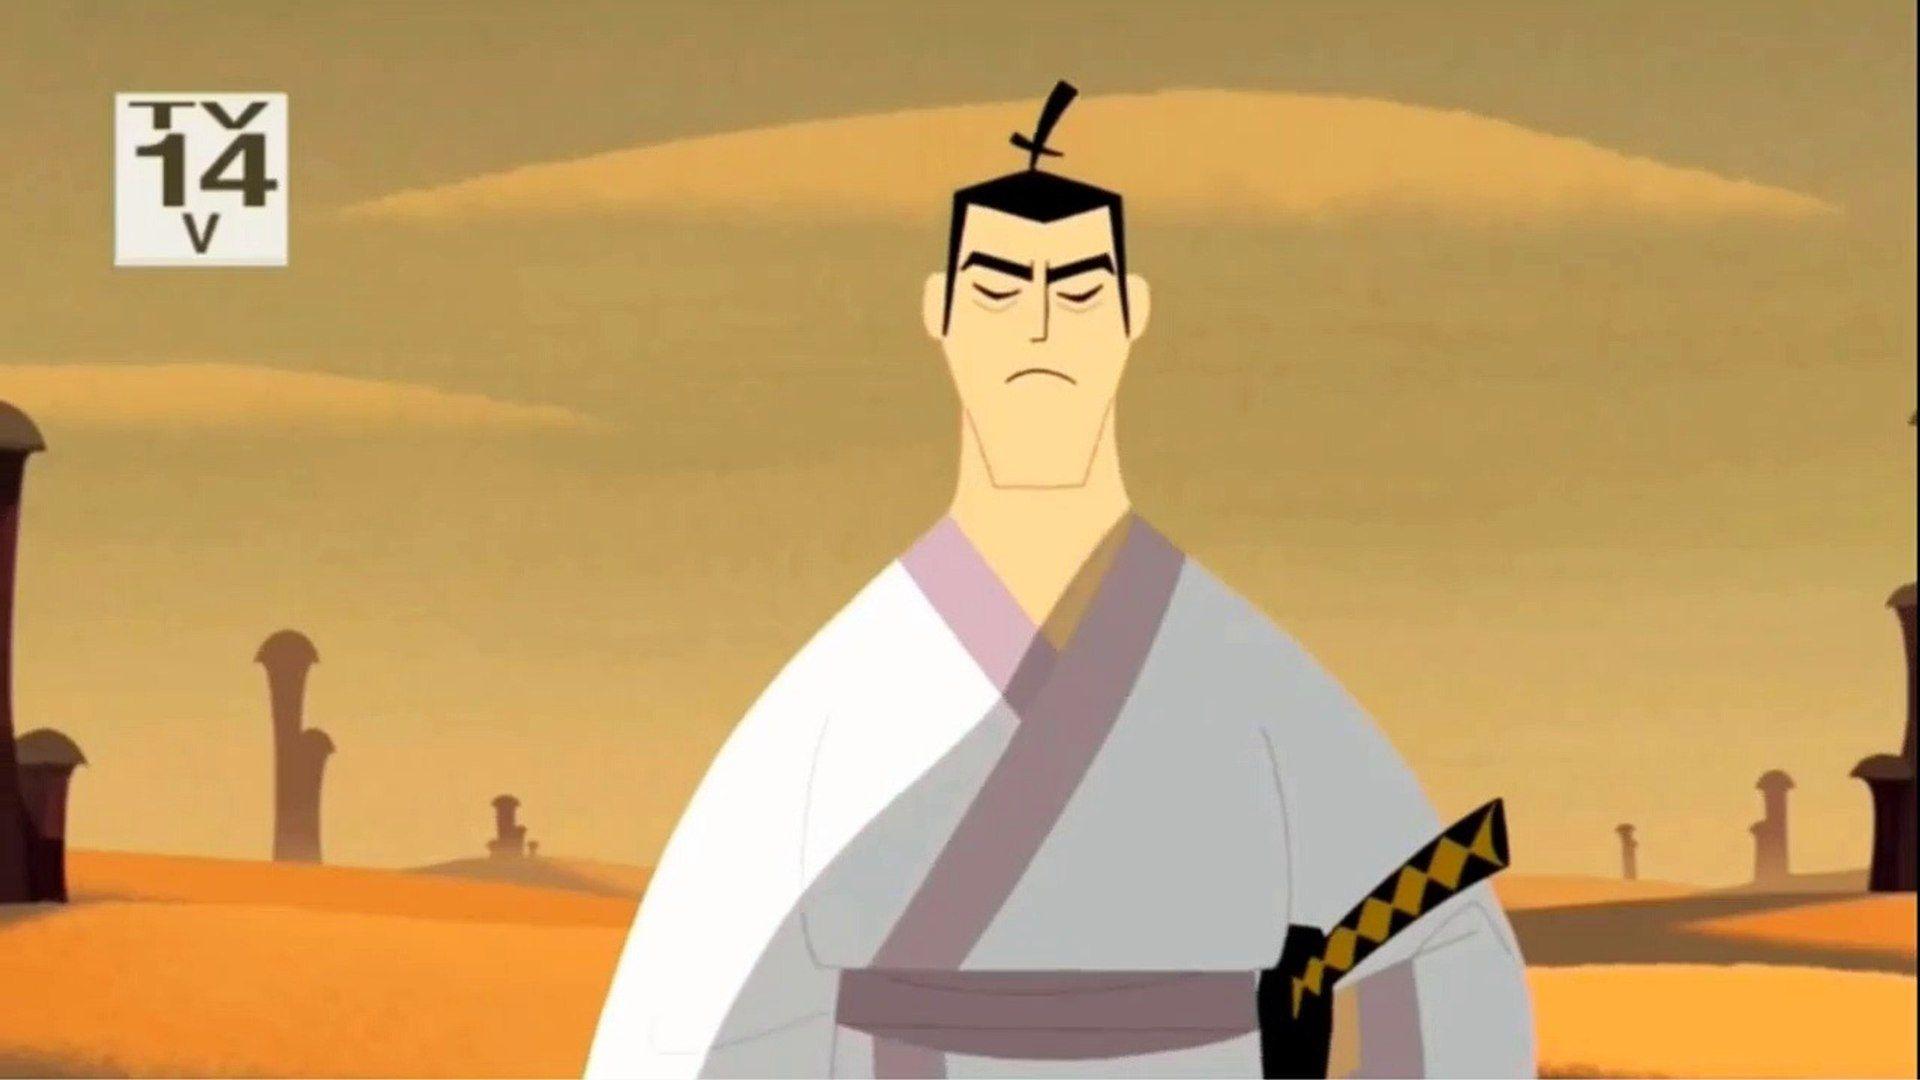 Samurai Jack free download wallpaper